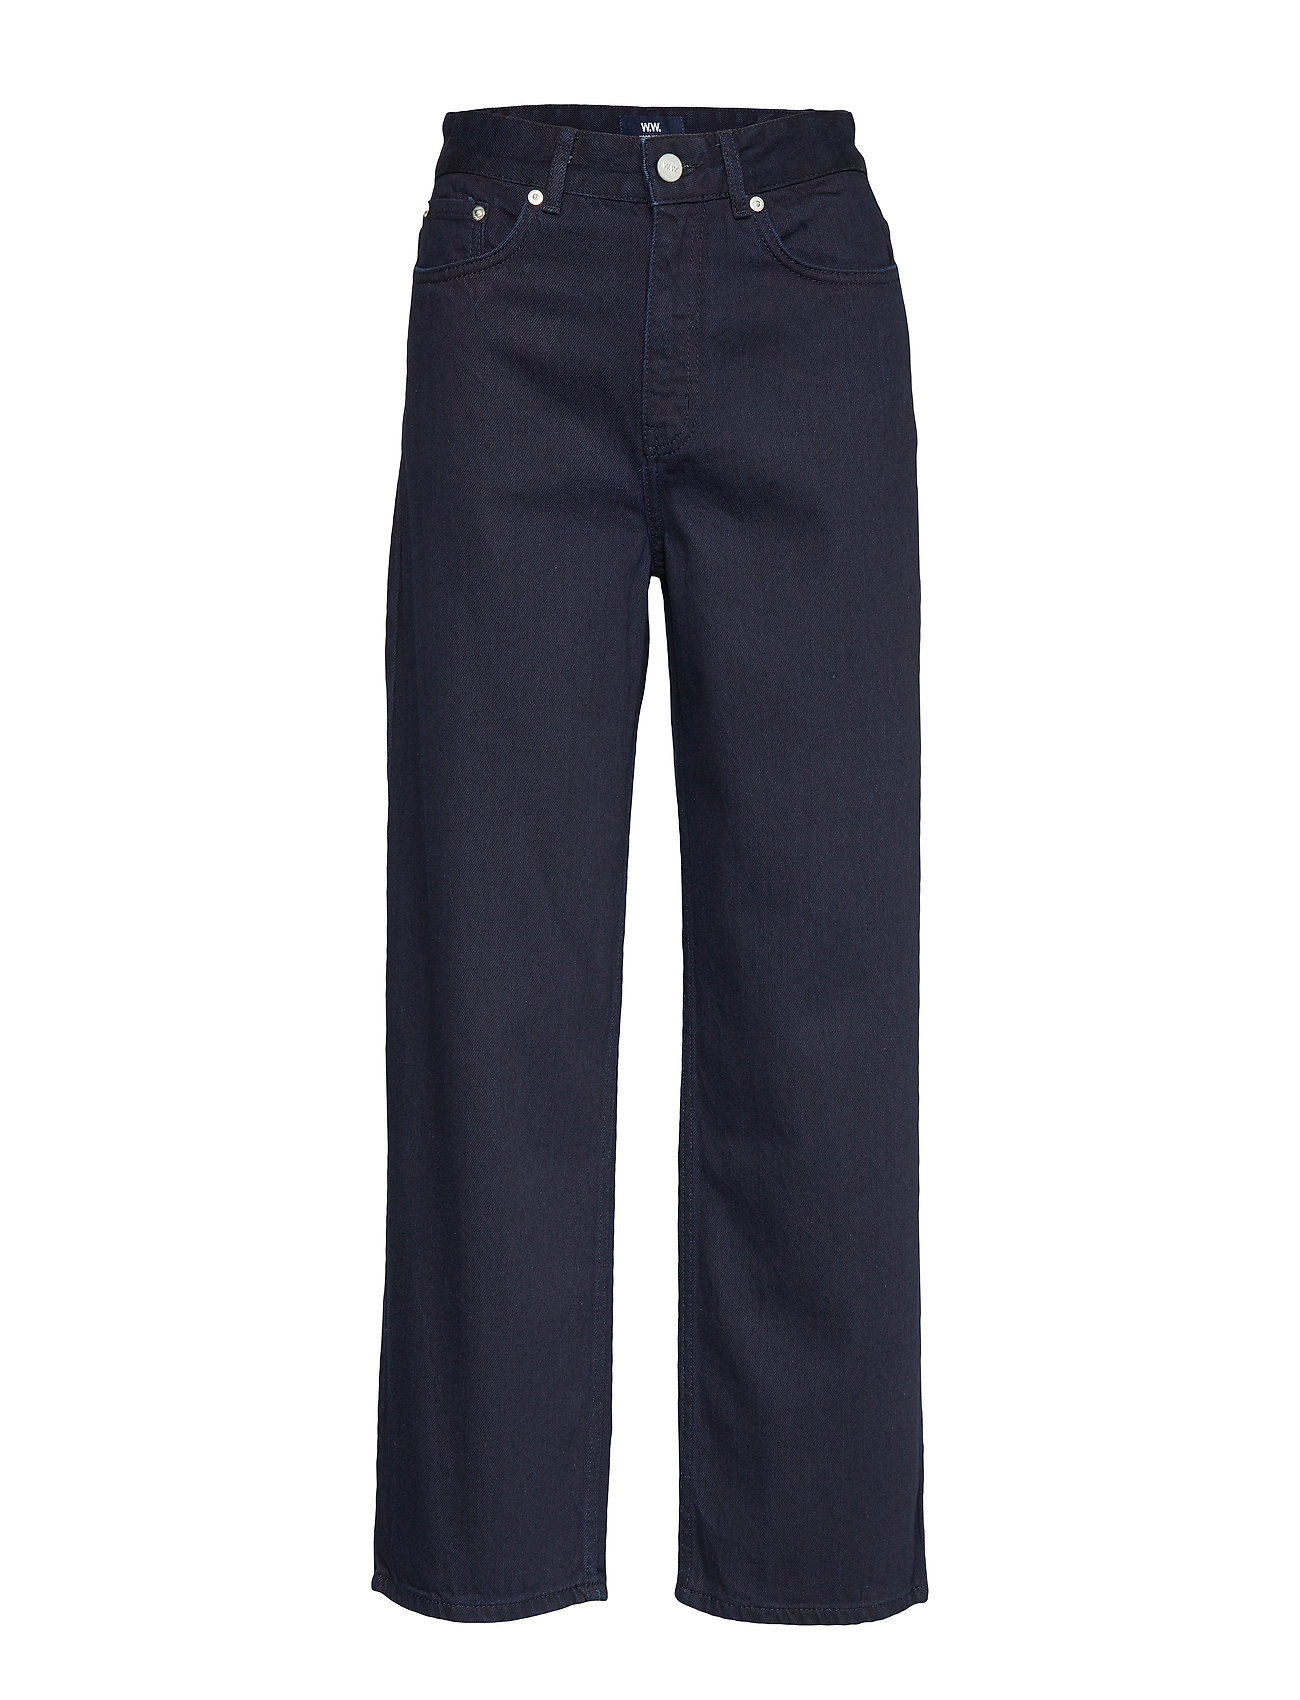 Wood Wood Ilo jeans - DARK RINSE